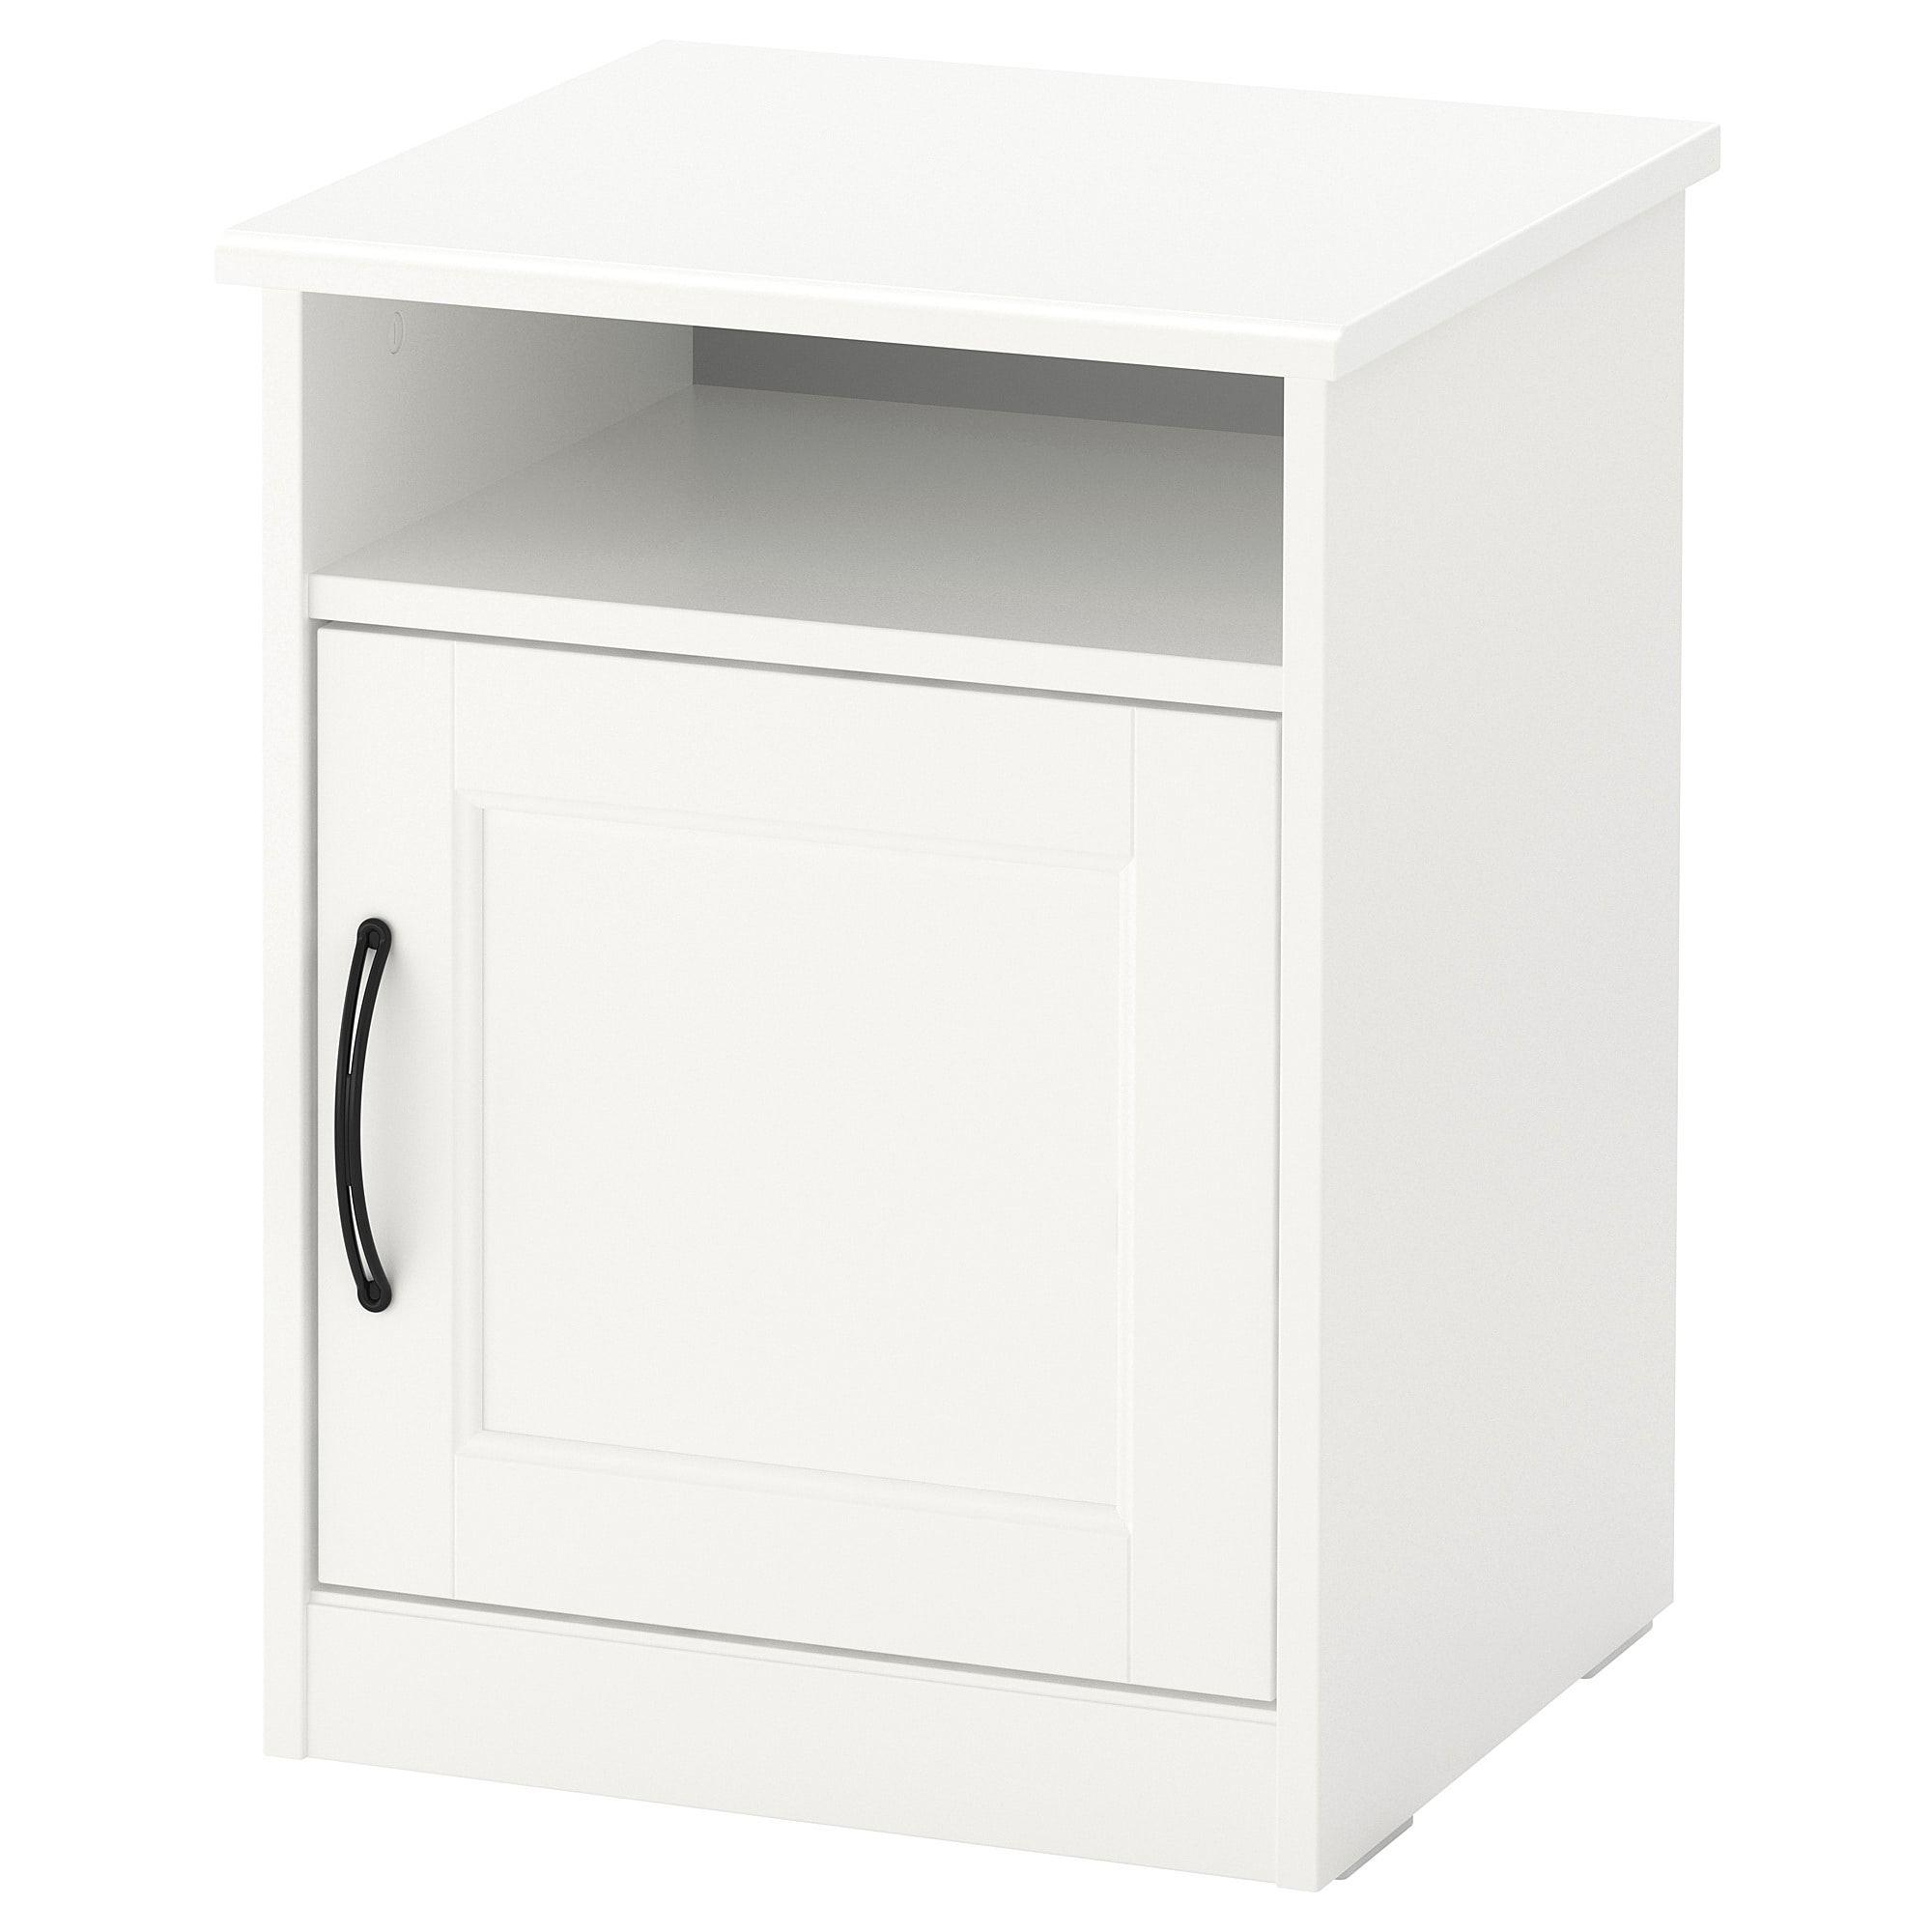 Armadio Metallico Esterno Ikea songesand comodino - bianco 42x40 cm | idee ikea, comodini